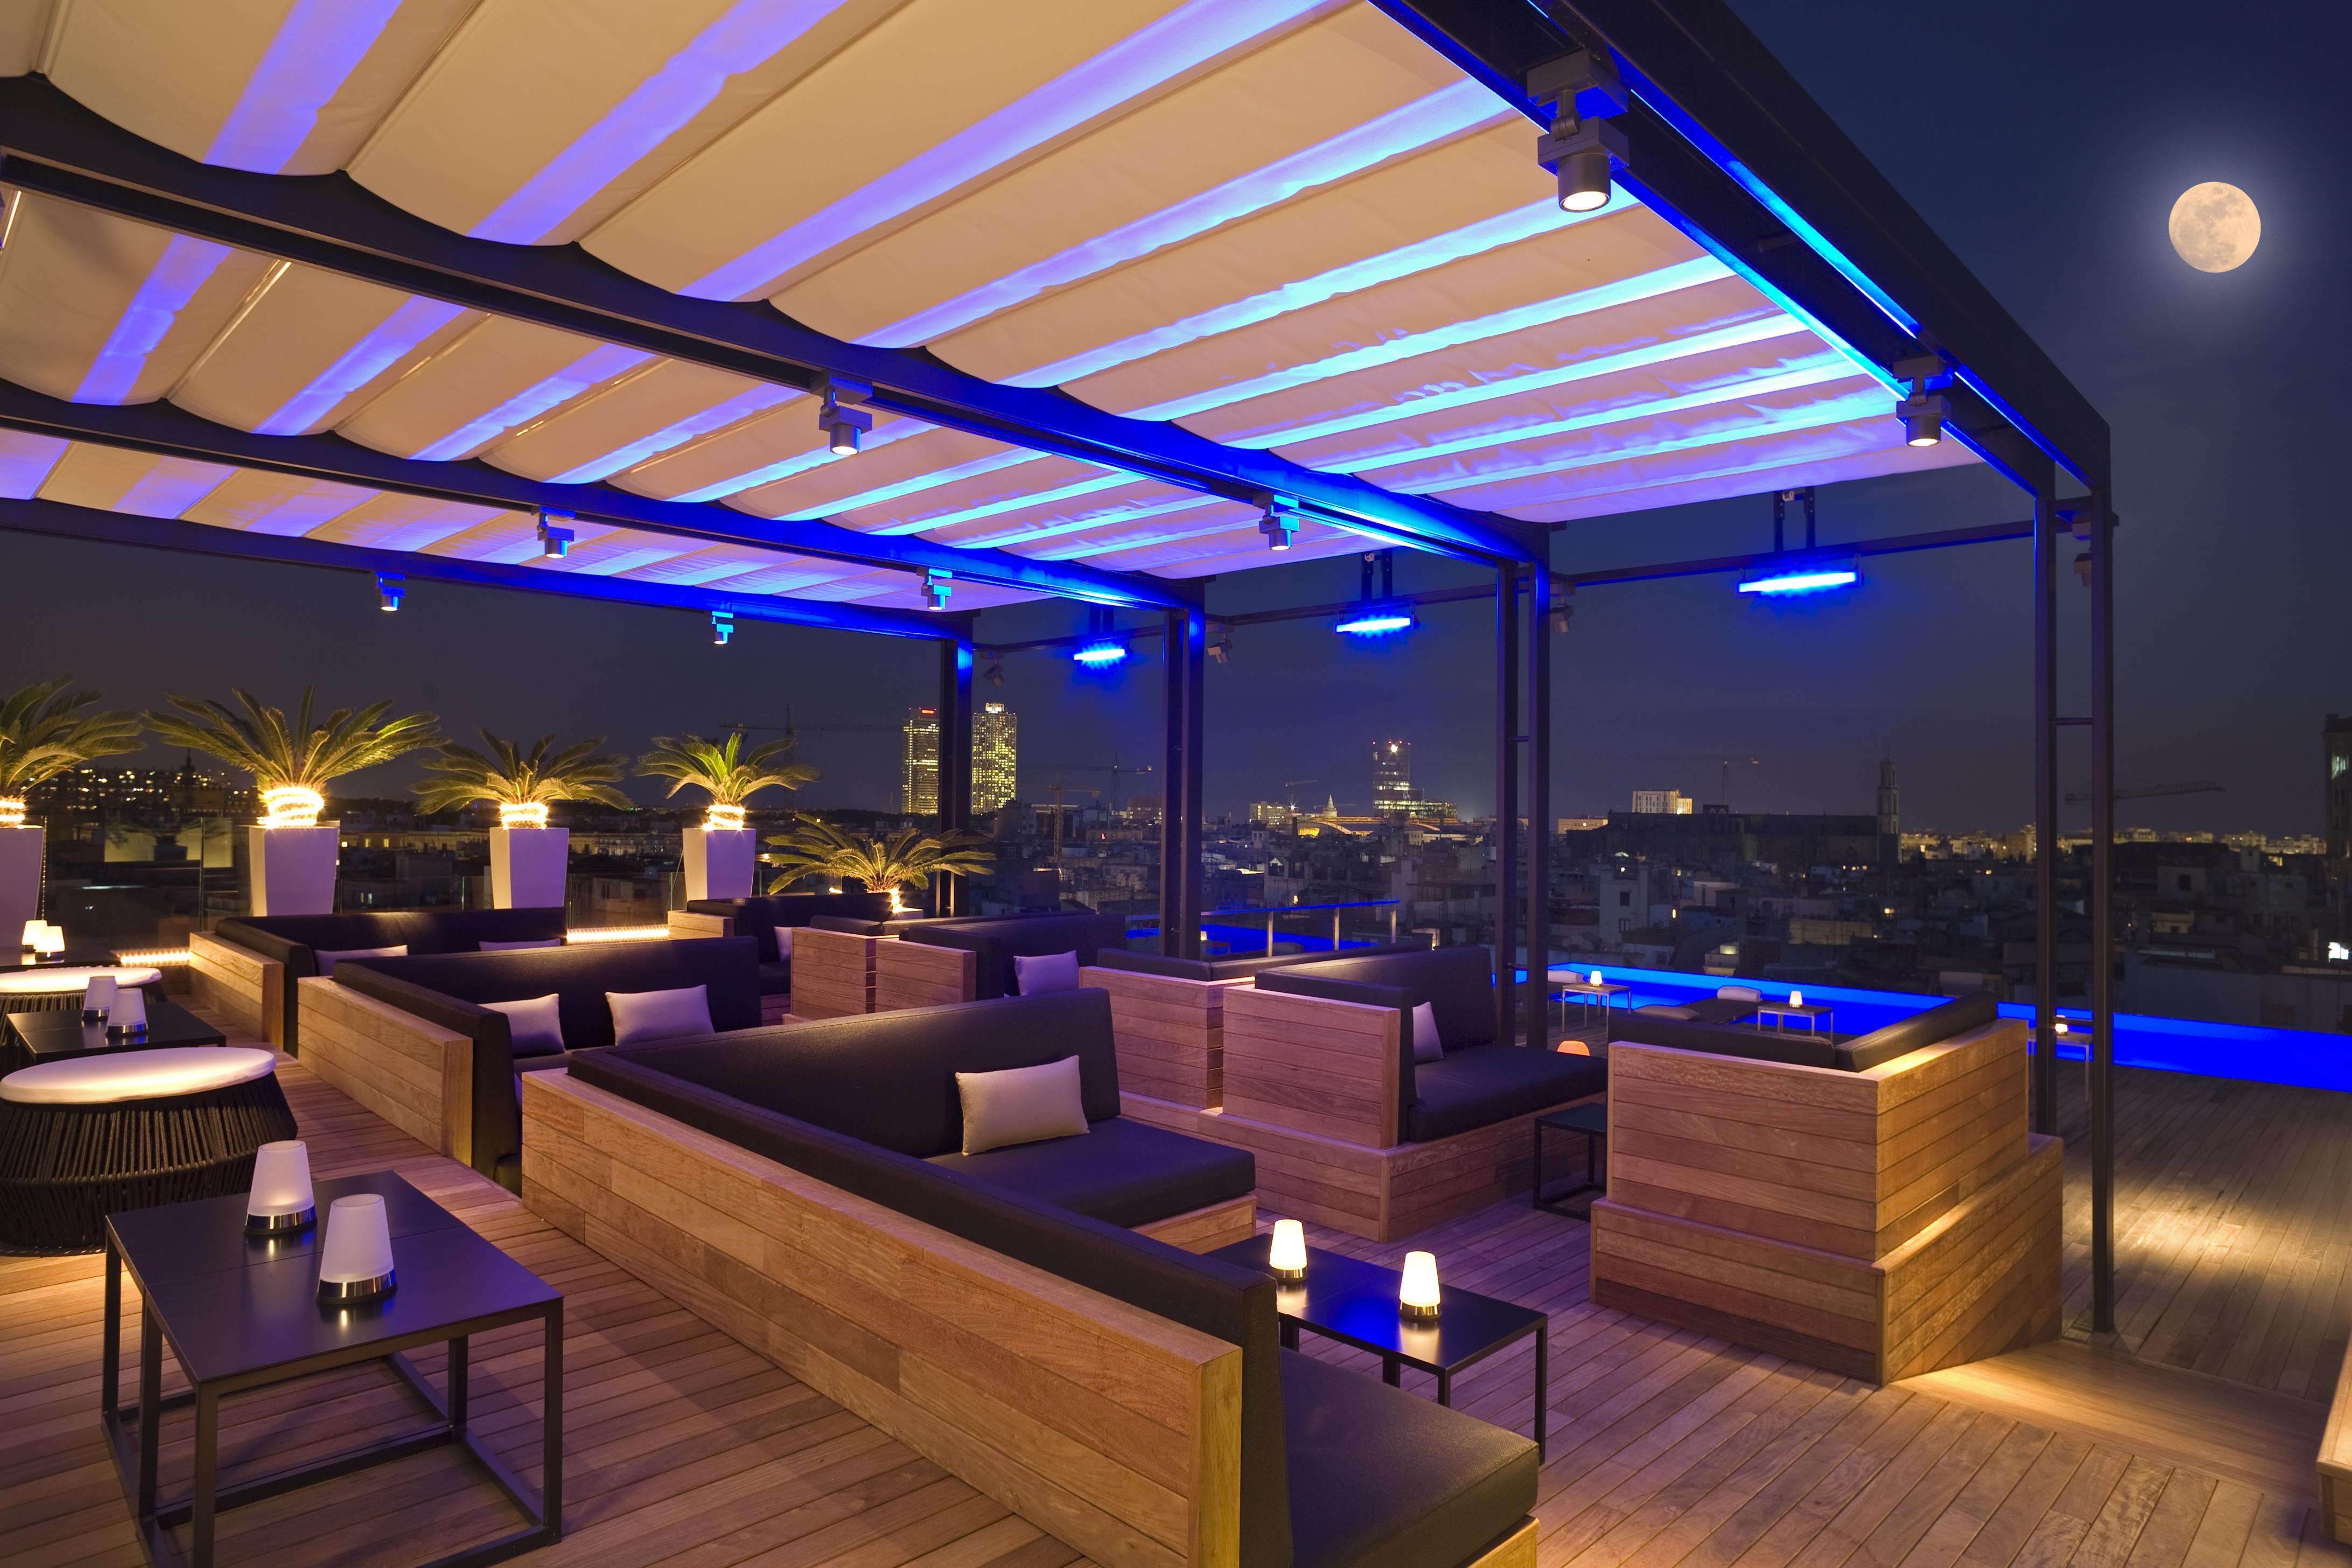 Especial terrazas oasis de relax paperblog for Decoracion bares modernos